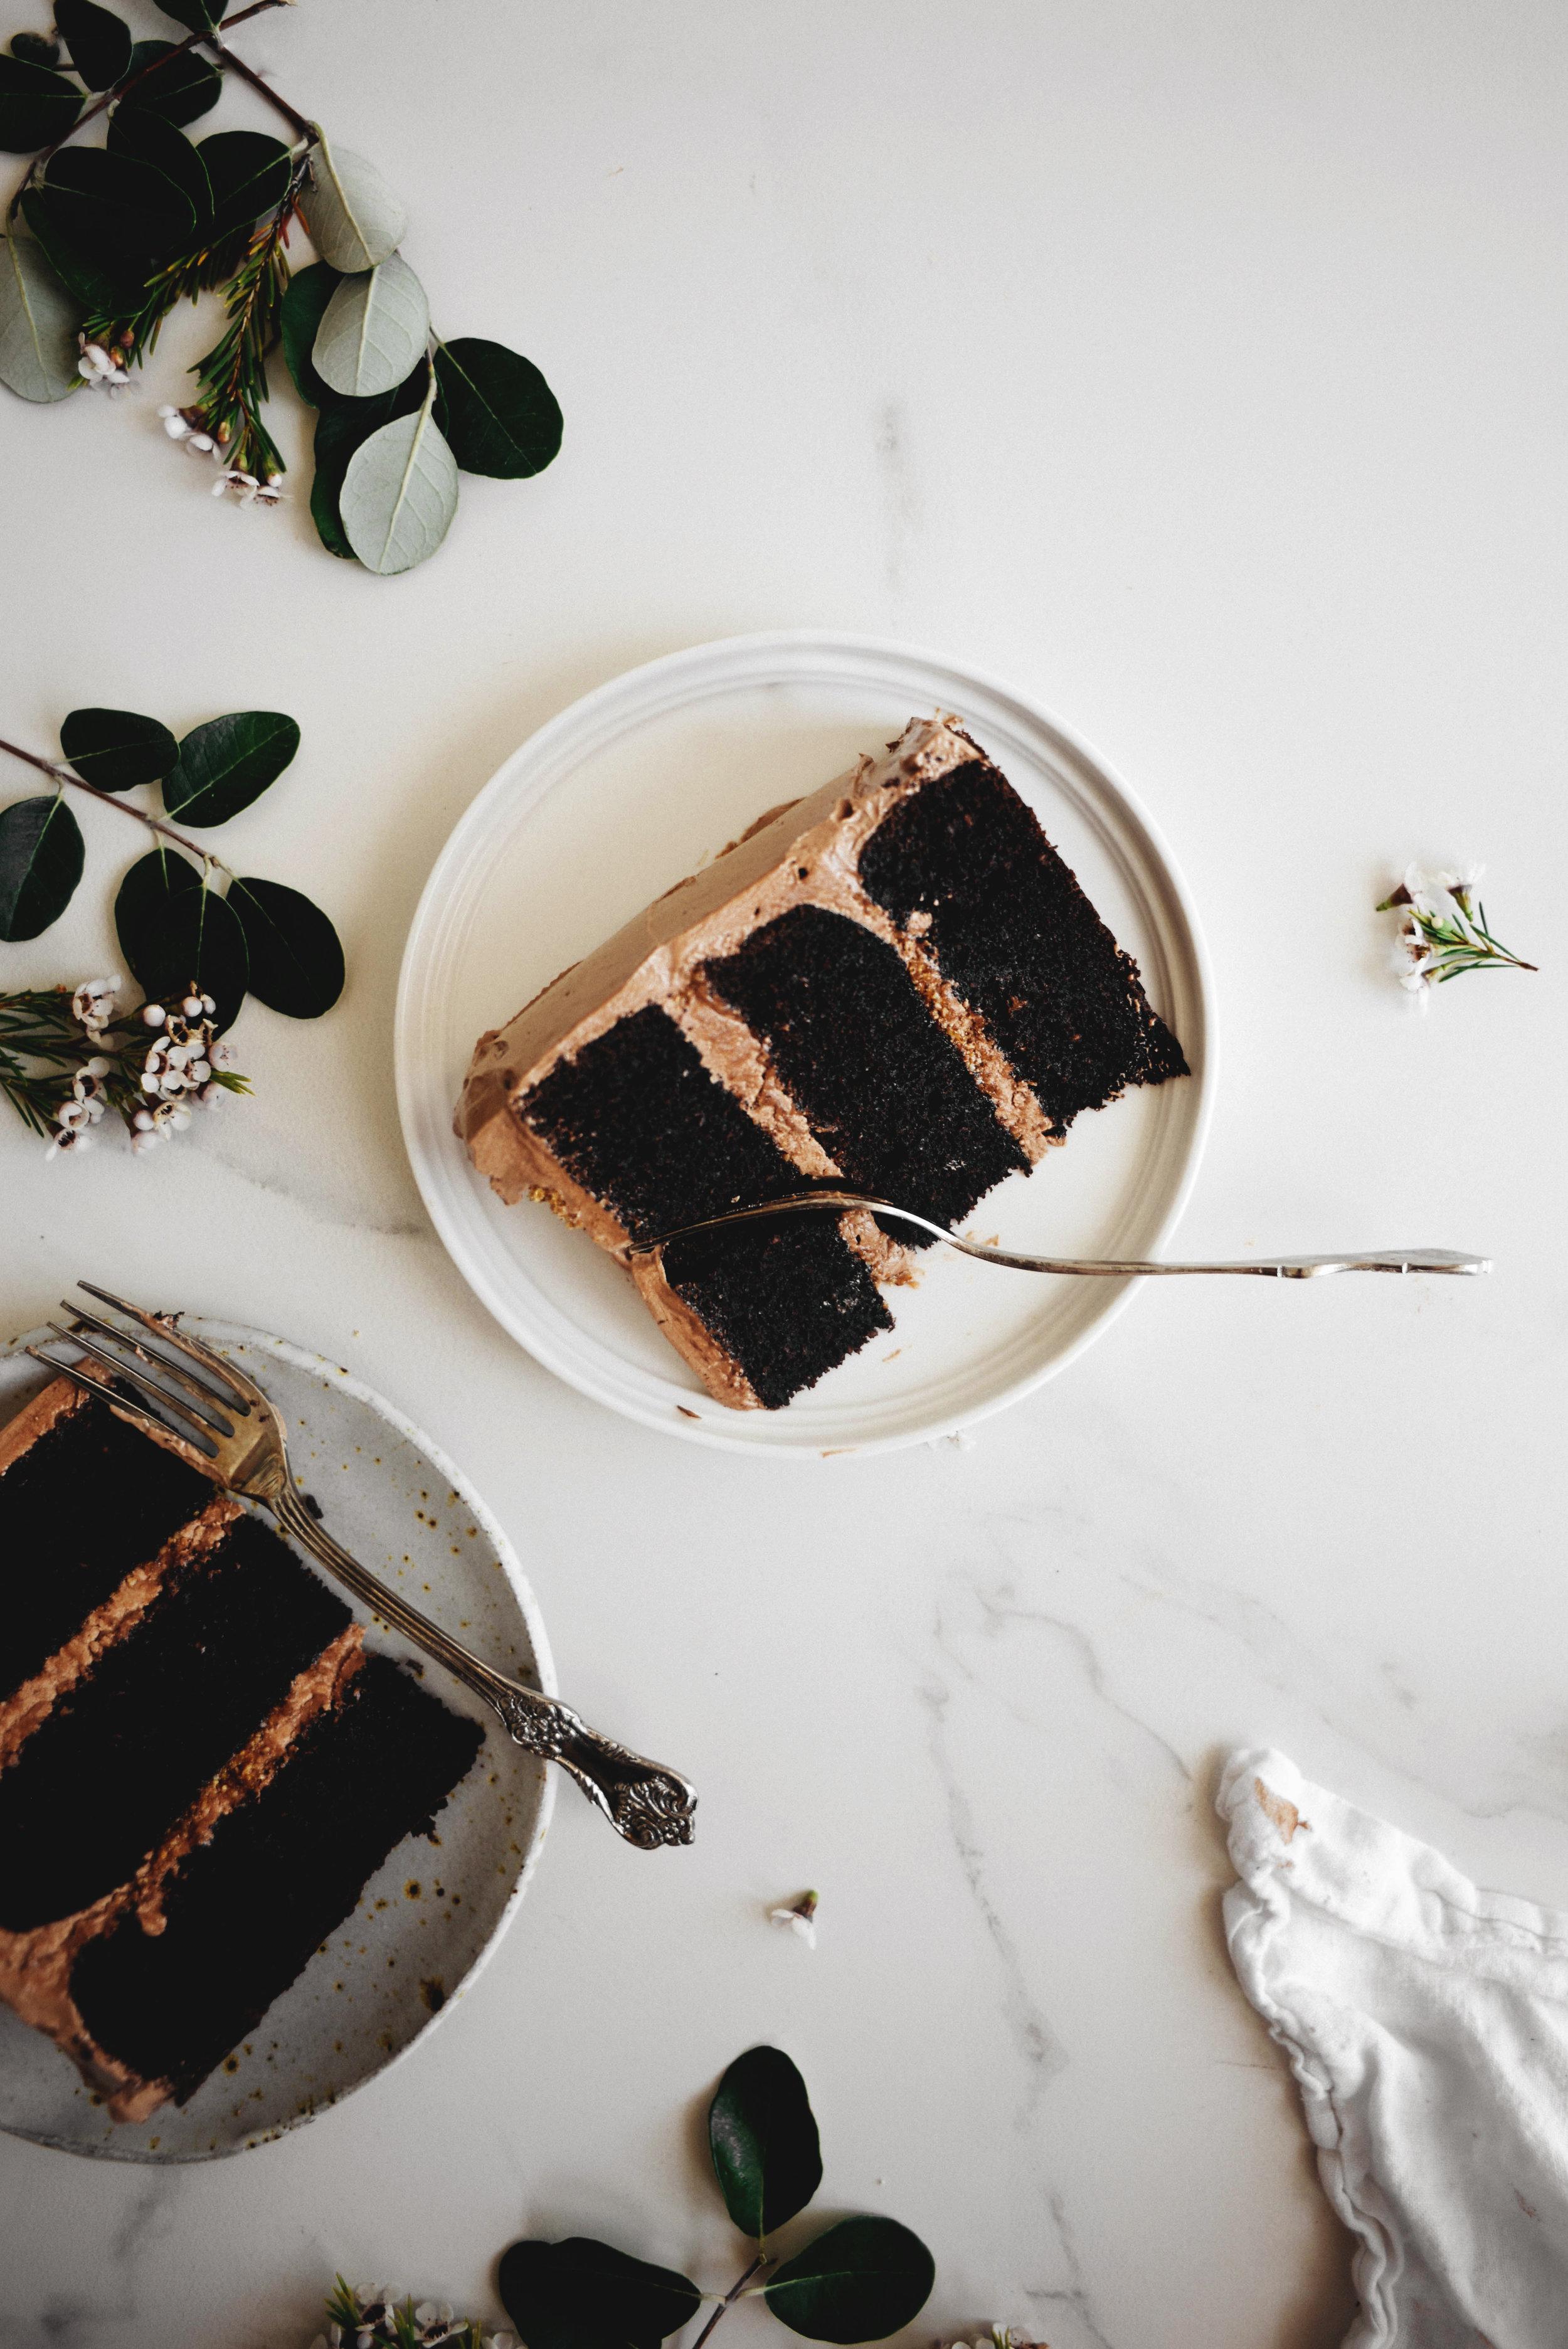 Chocolate-Hazelnut-Cake-with-Gianduja-Praline-Swiss-Meringue-Buttercream-2.jpg